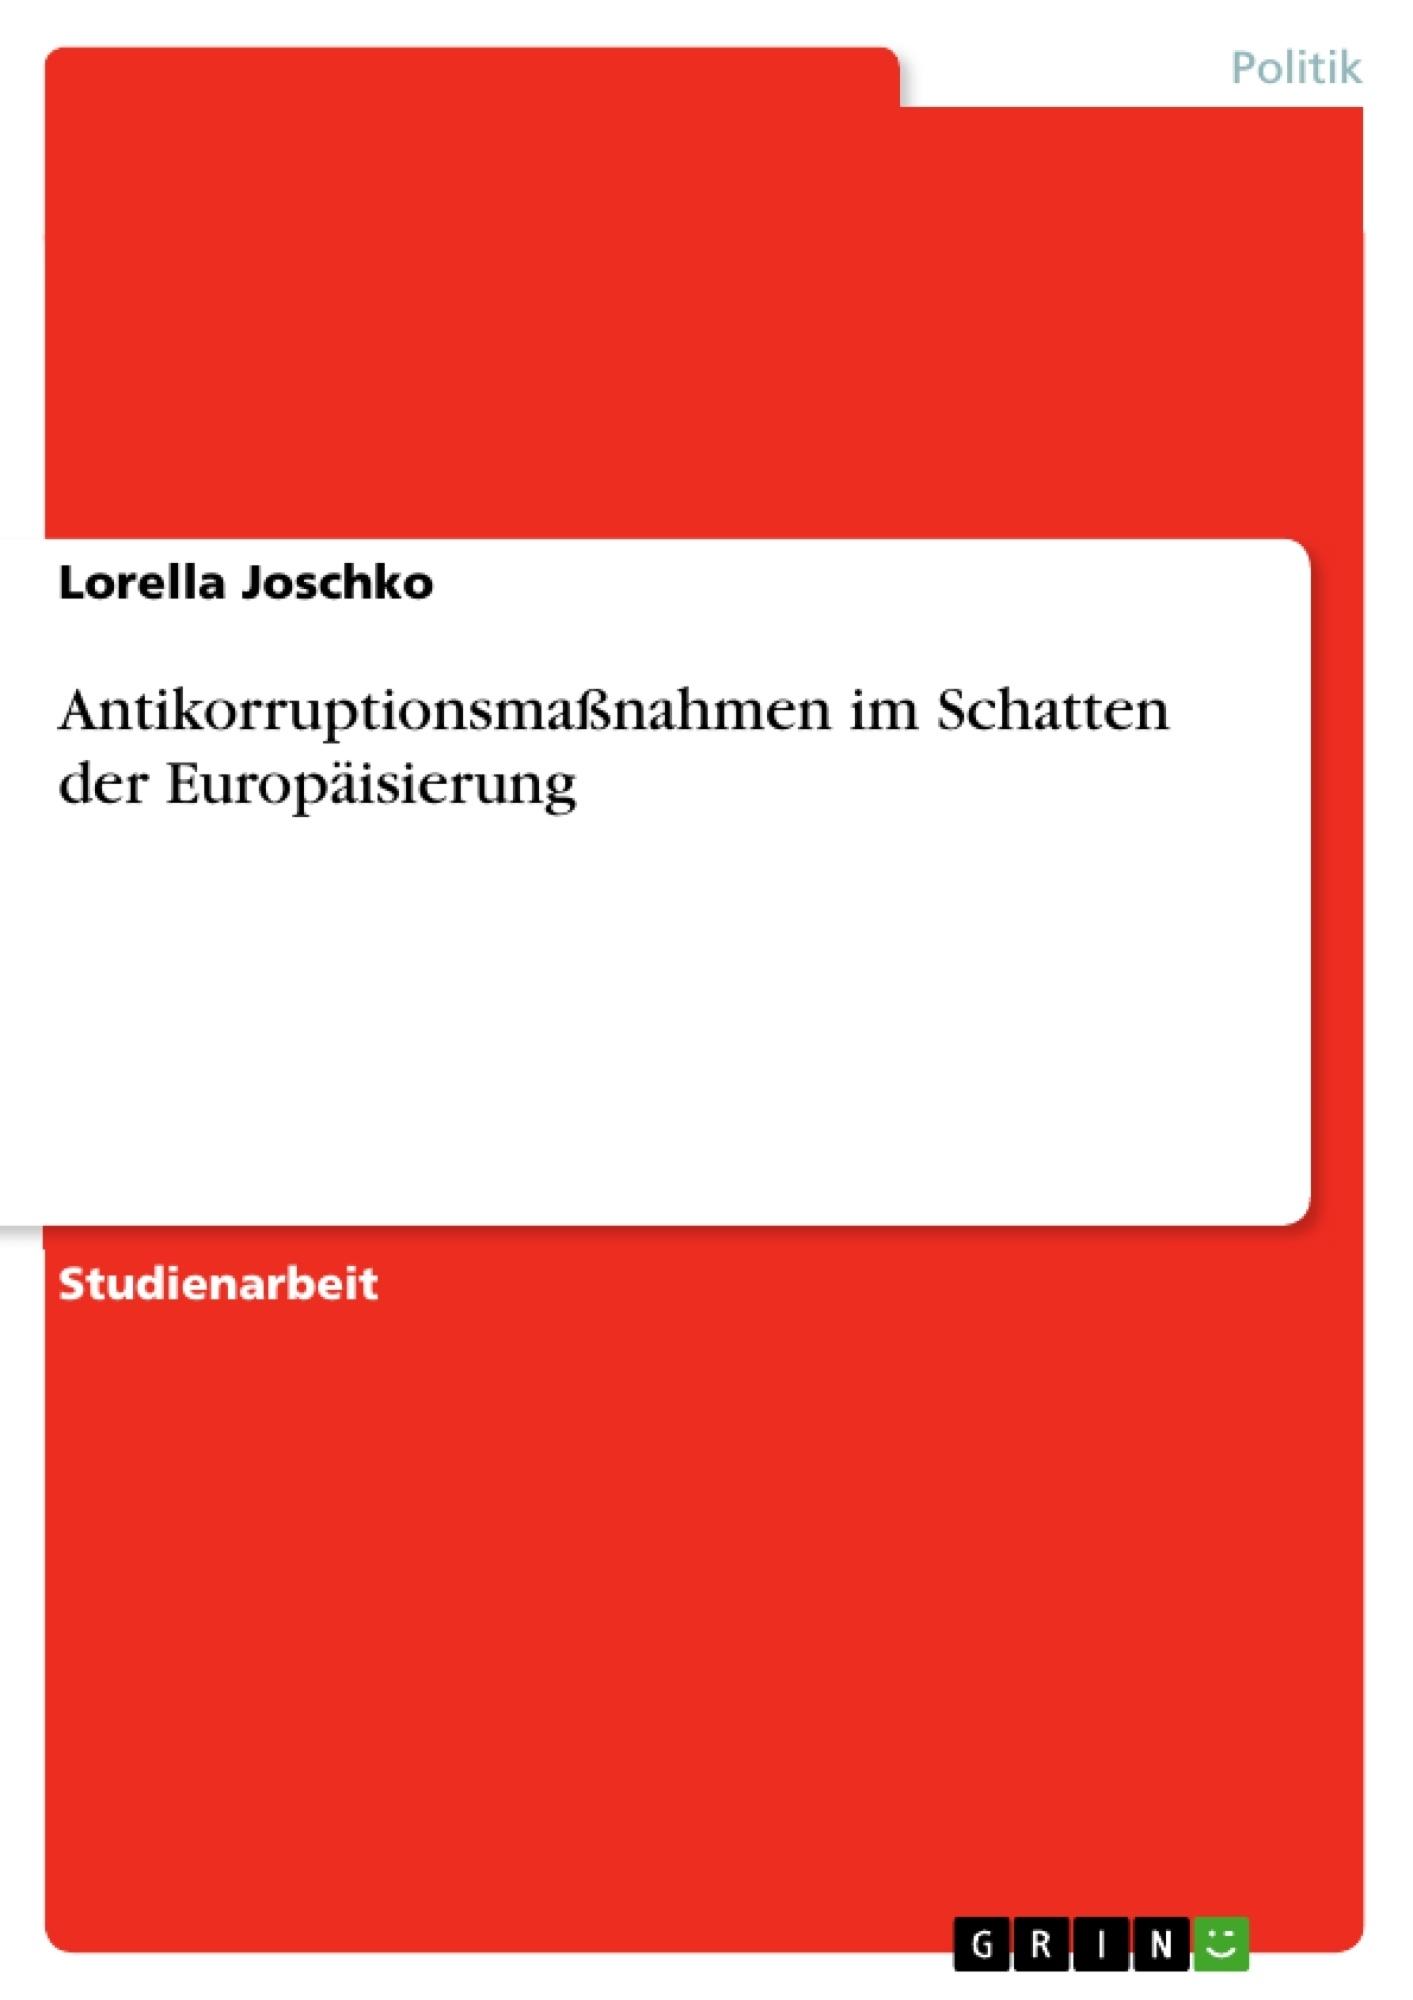 Titel: Antikorruptionsmaßnahmen im Schatten der Europäisierung